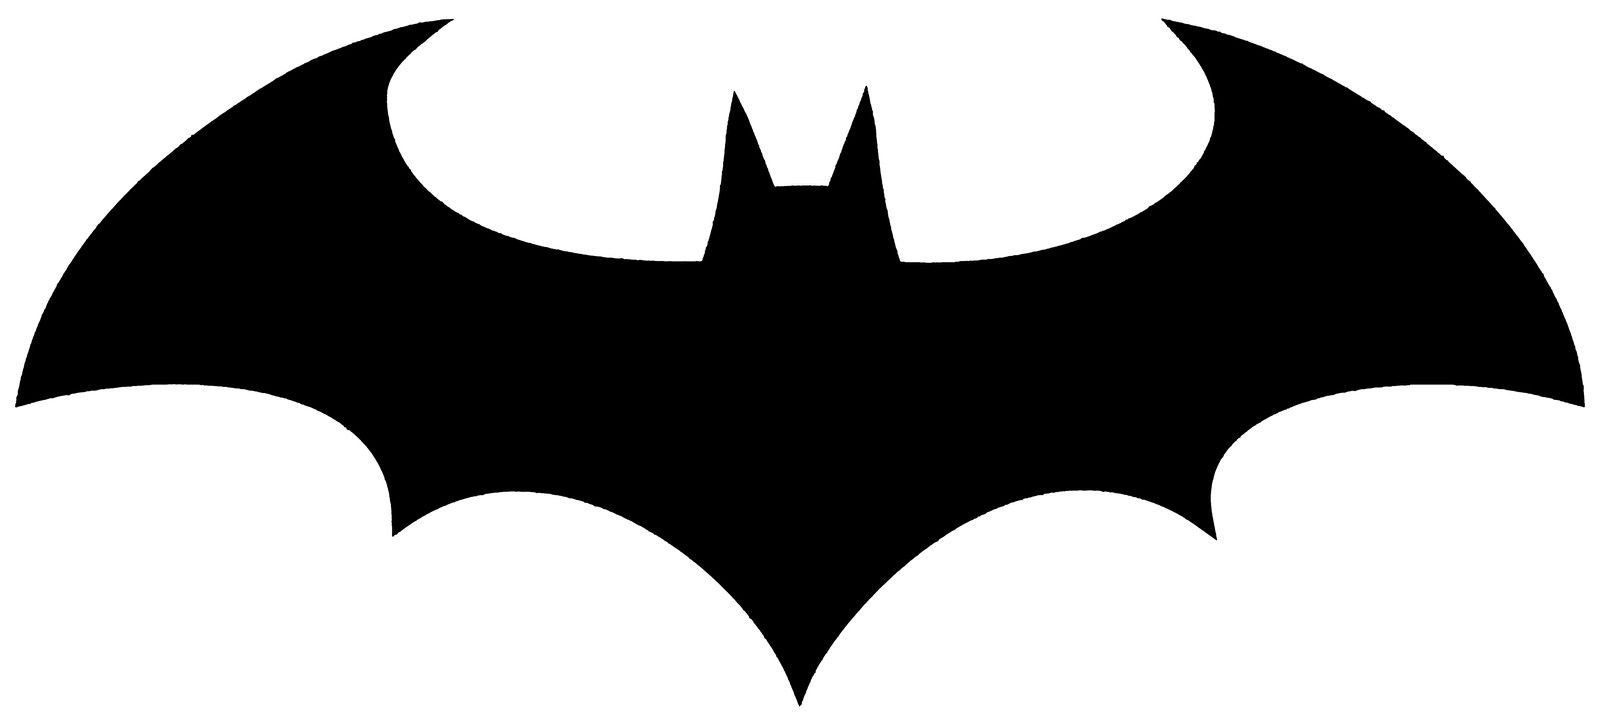 Batman Arkham Knight Logo Car Van Laptop Scooter Vinyl Decal Sticker Desenho Batman Simbolo Batman Arte De Barbante E Prego